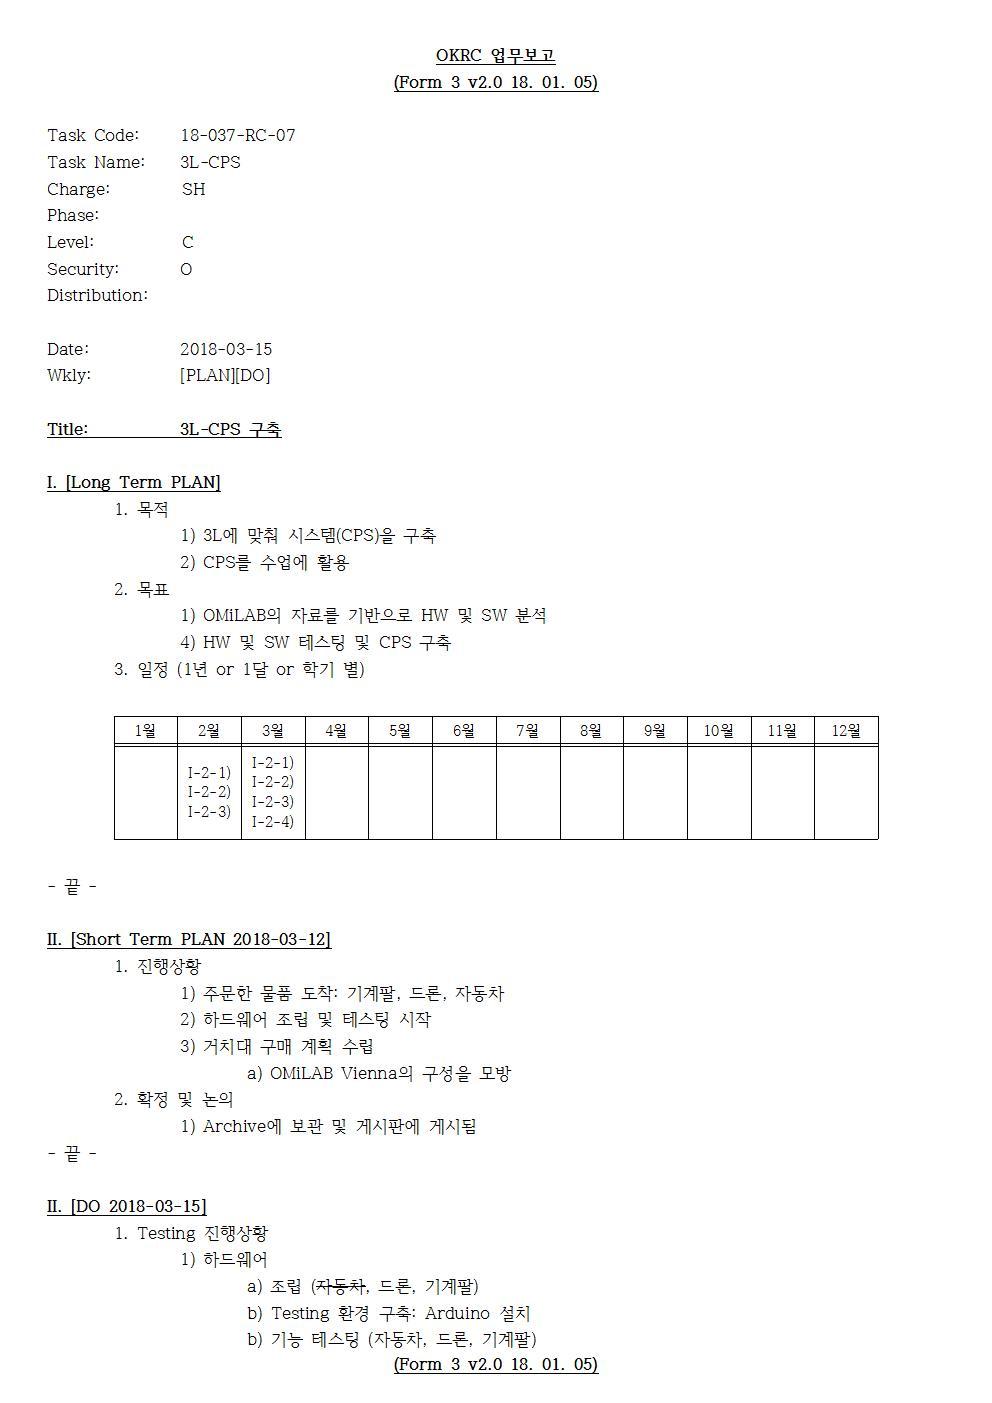 D-[18-037-RC-07]-[3L-CPS]-[2018-03-15][SH]001.jpg